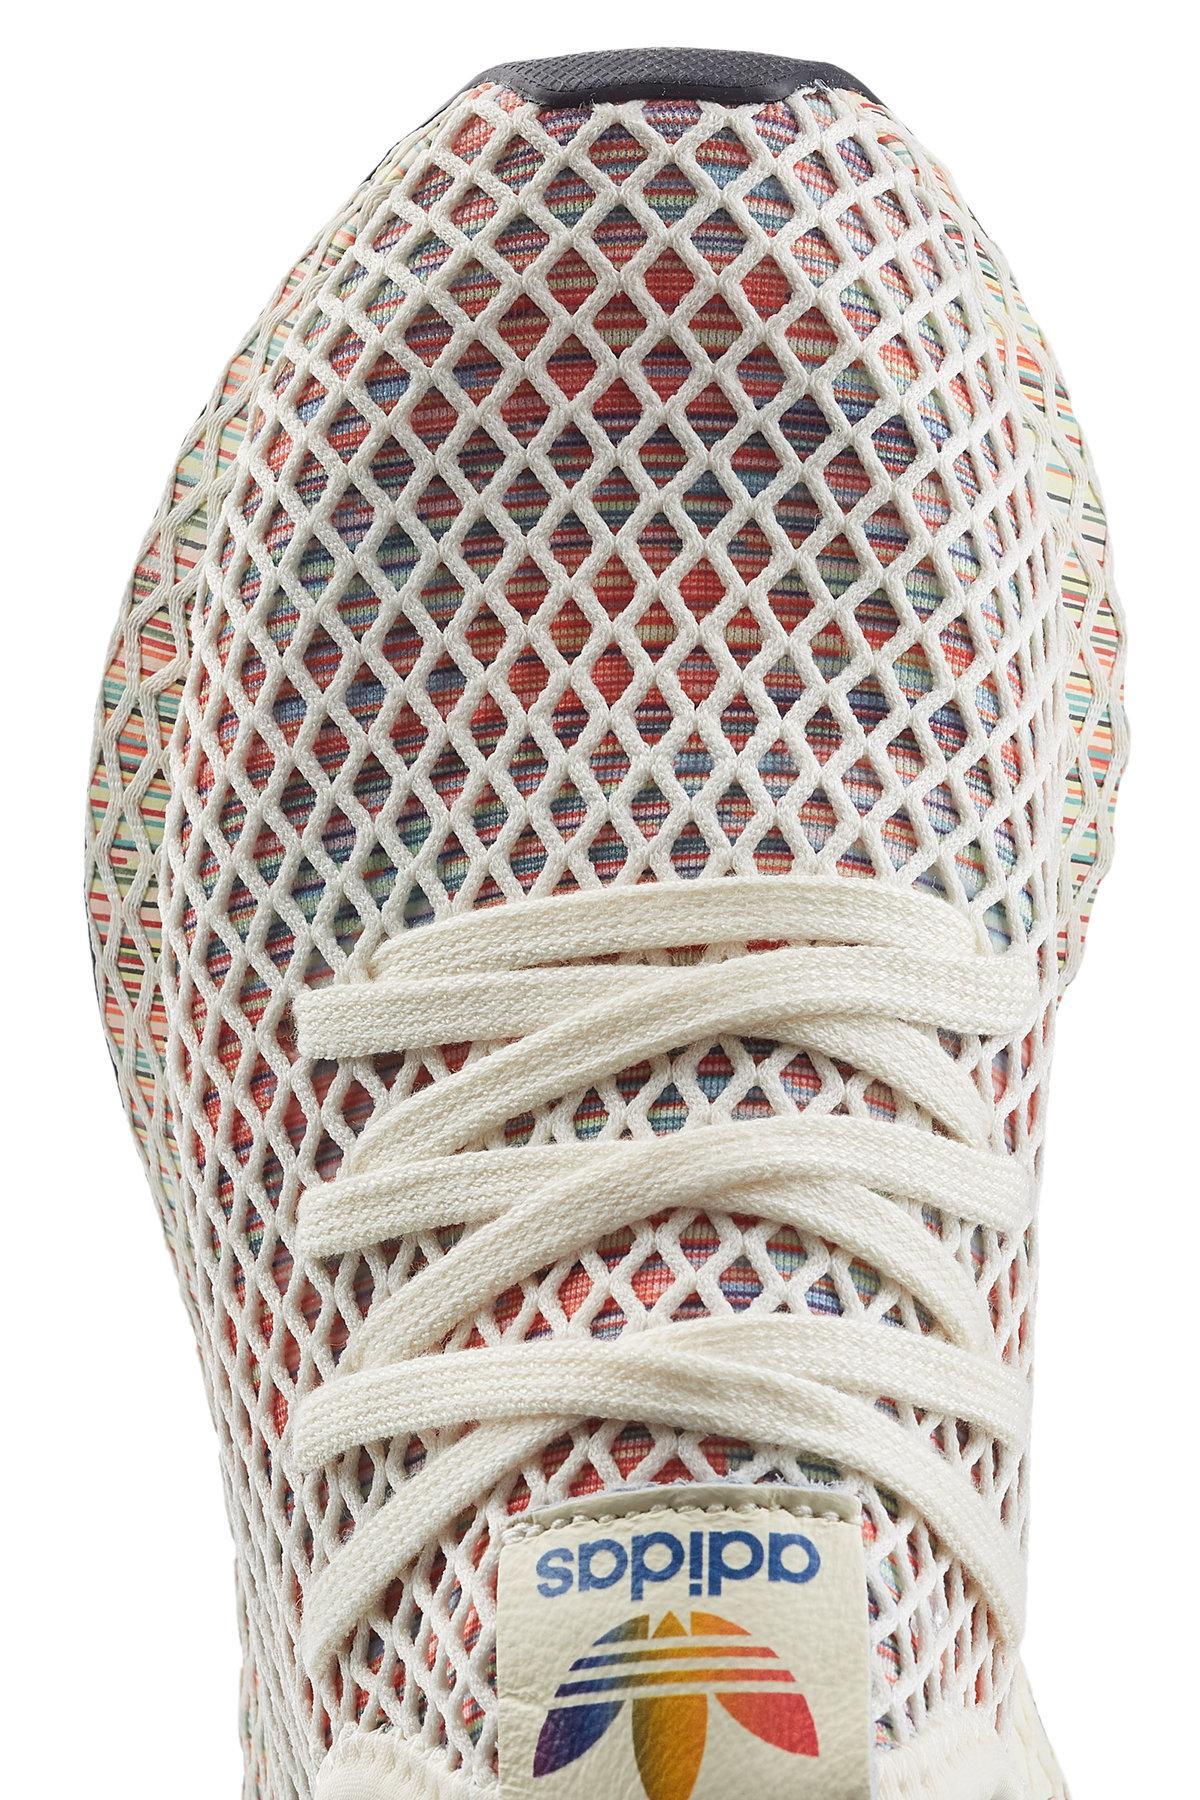 official photos 493a9 463d6 Lyst - adidas Originals Deerupt Runner Pride Sneakers